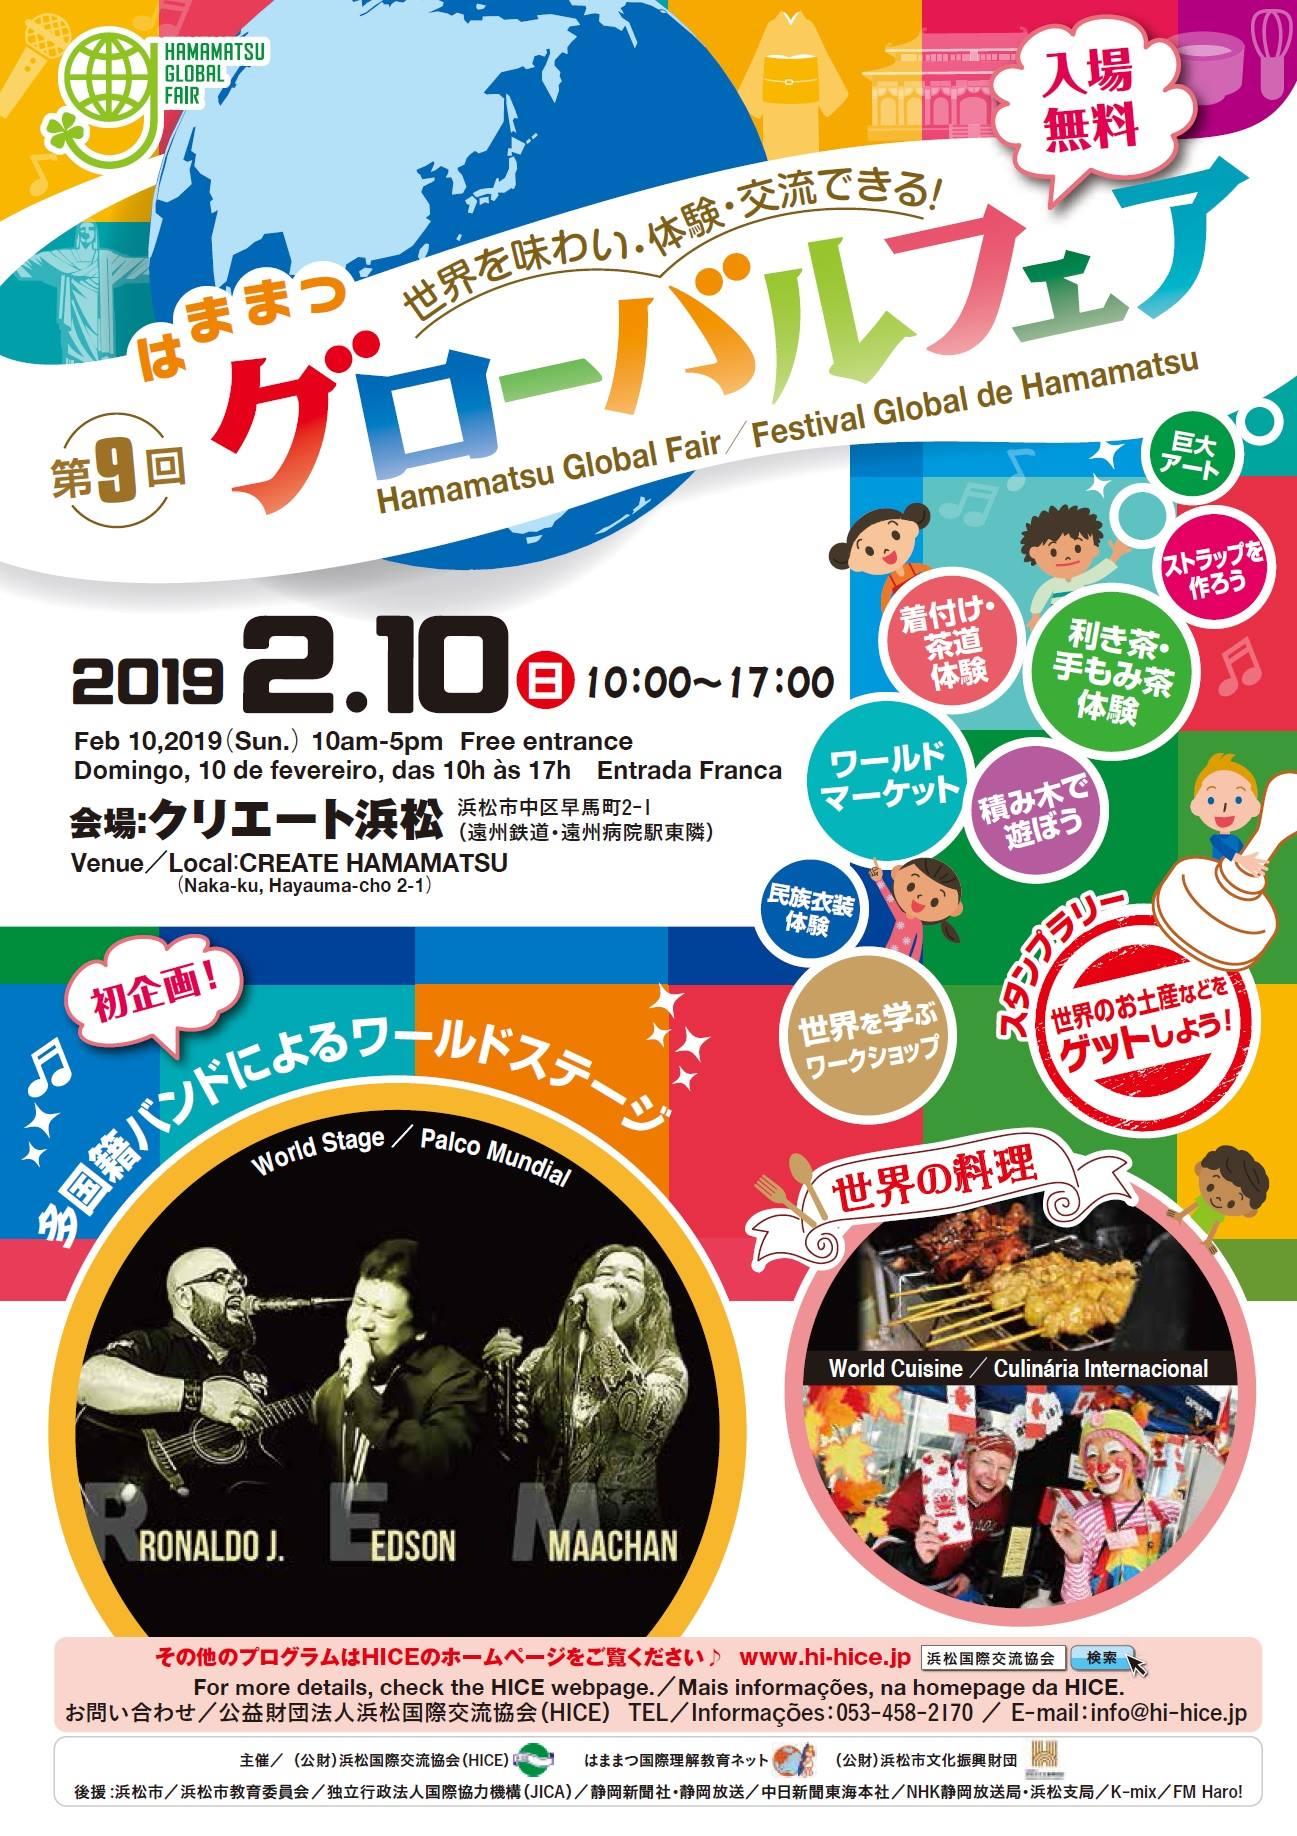 https://www.inhamamatsu.com/japanese/recommend/gbf2019_omo.jpg